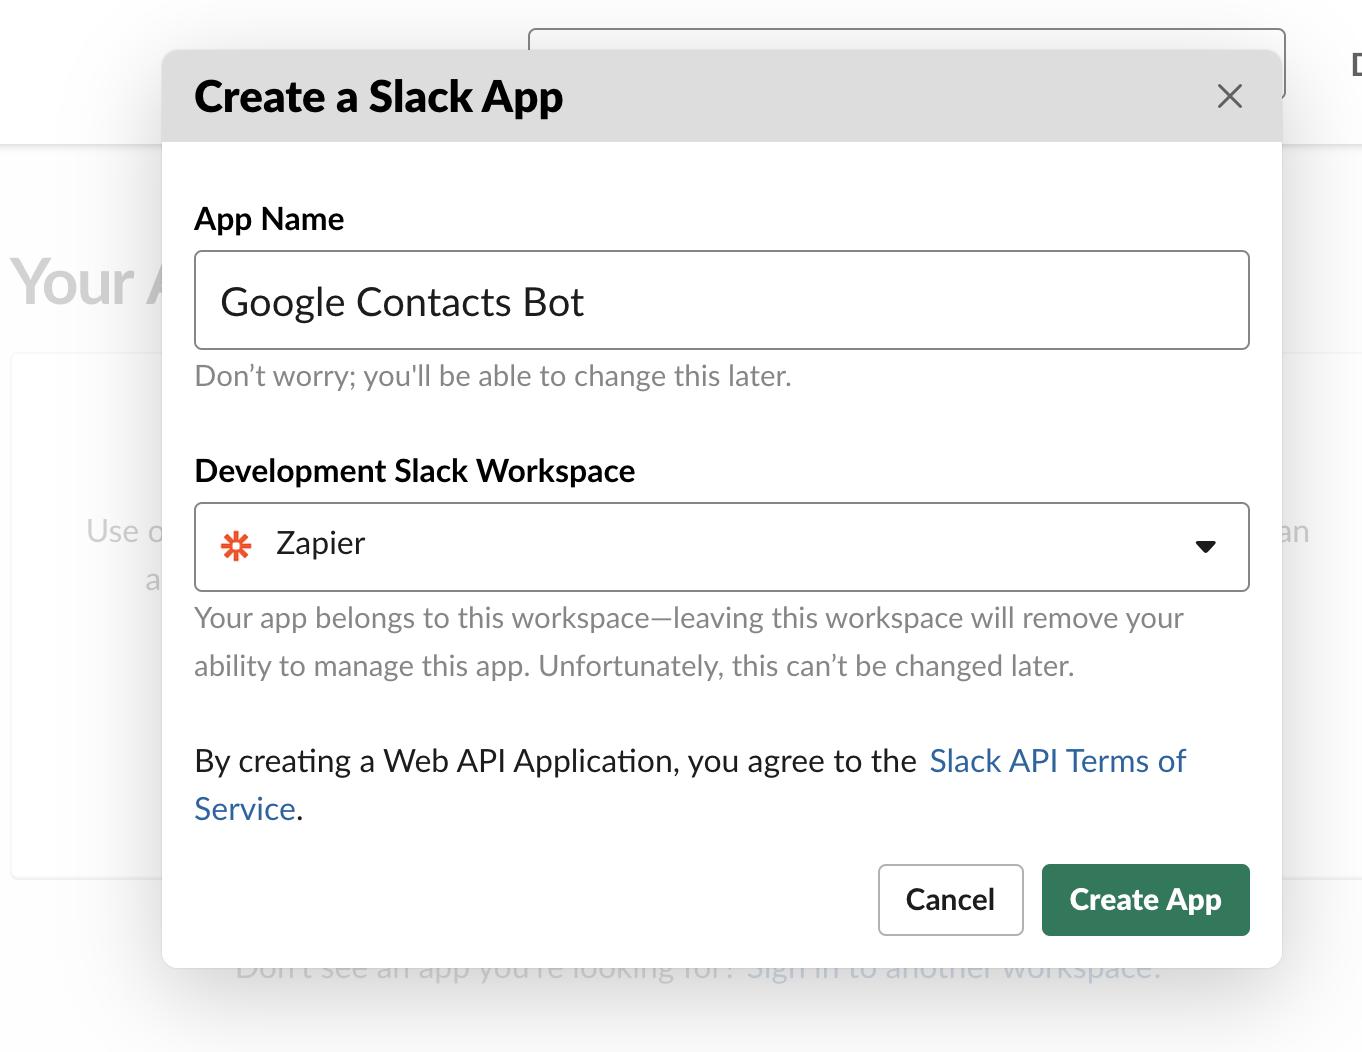 How to build Slackbot with Kotlin, Ktor & deploy to Heroku